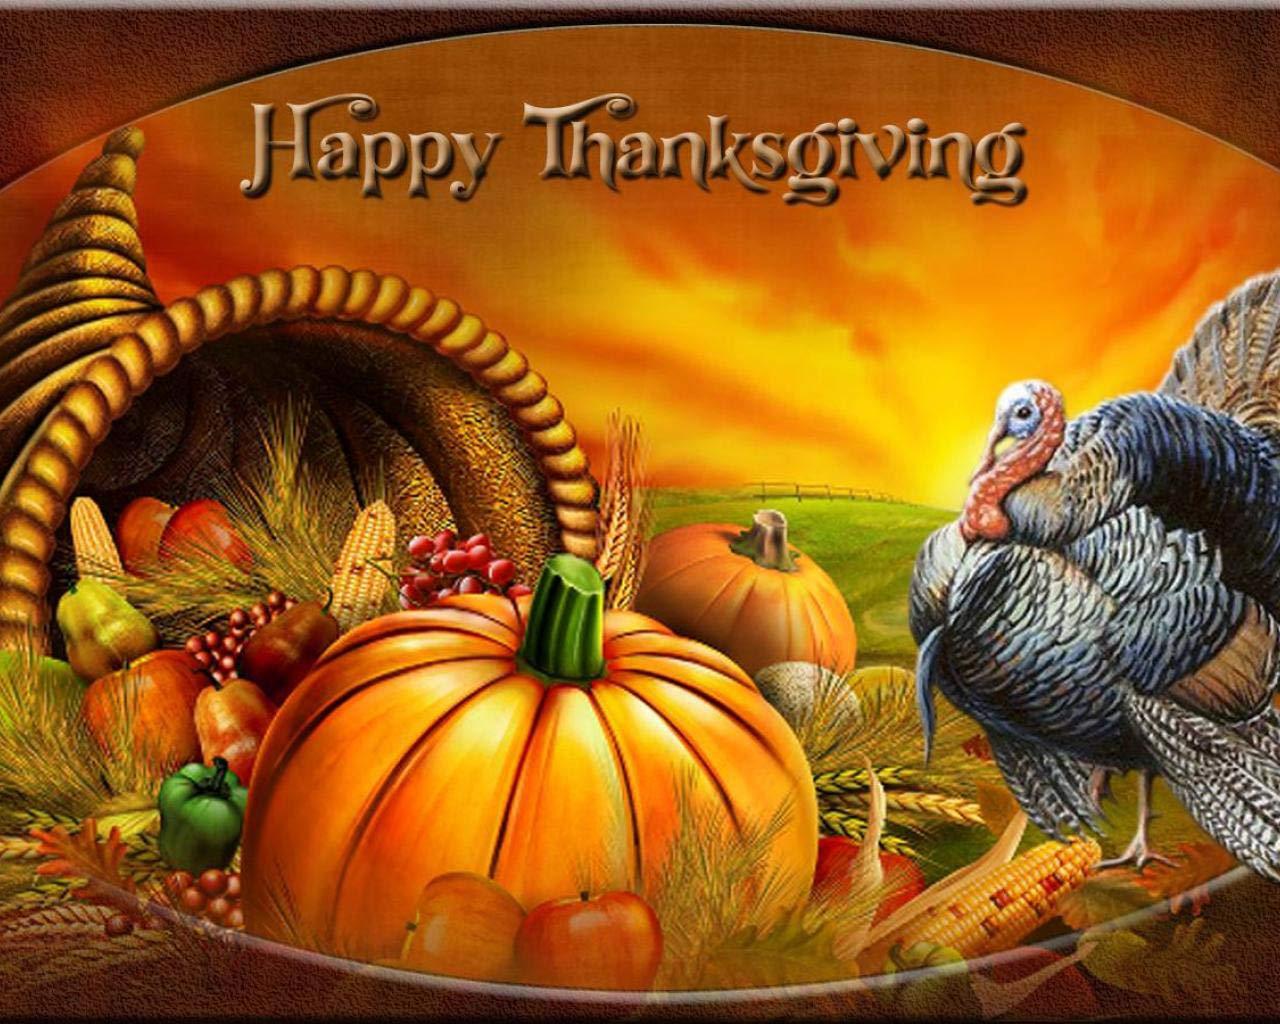 Happy Thanksgiving 2017 - HD Wallpaper